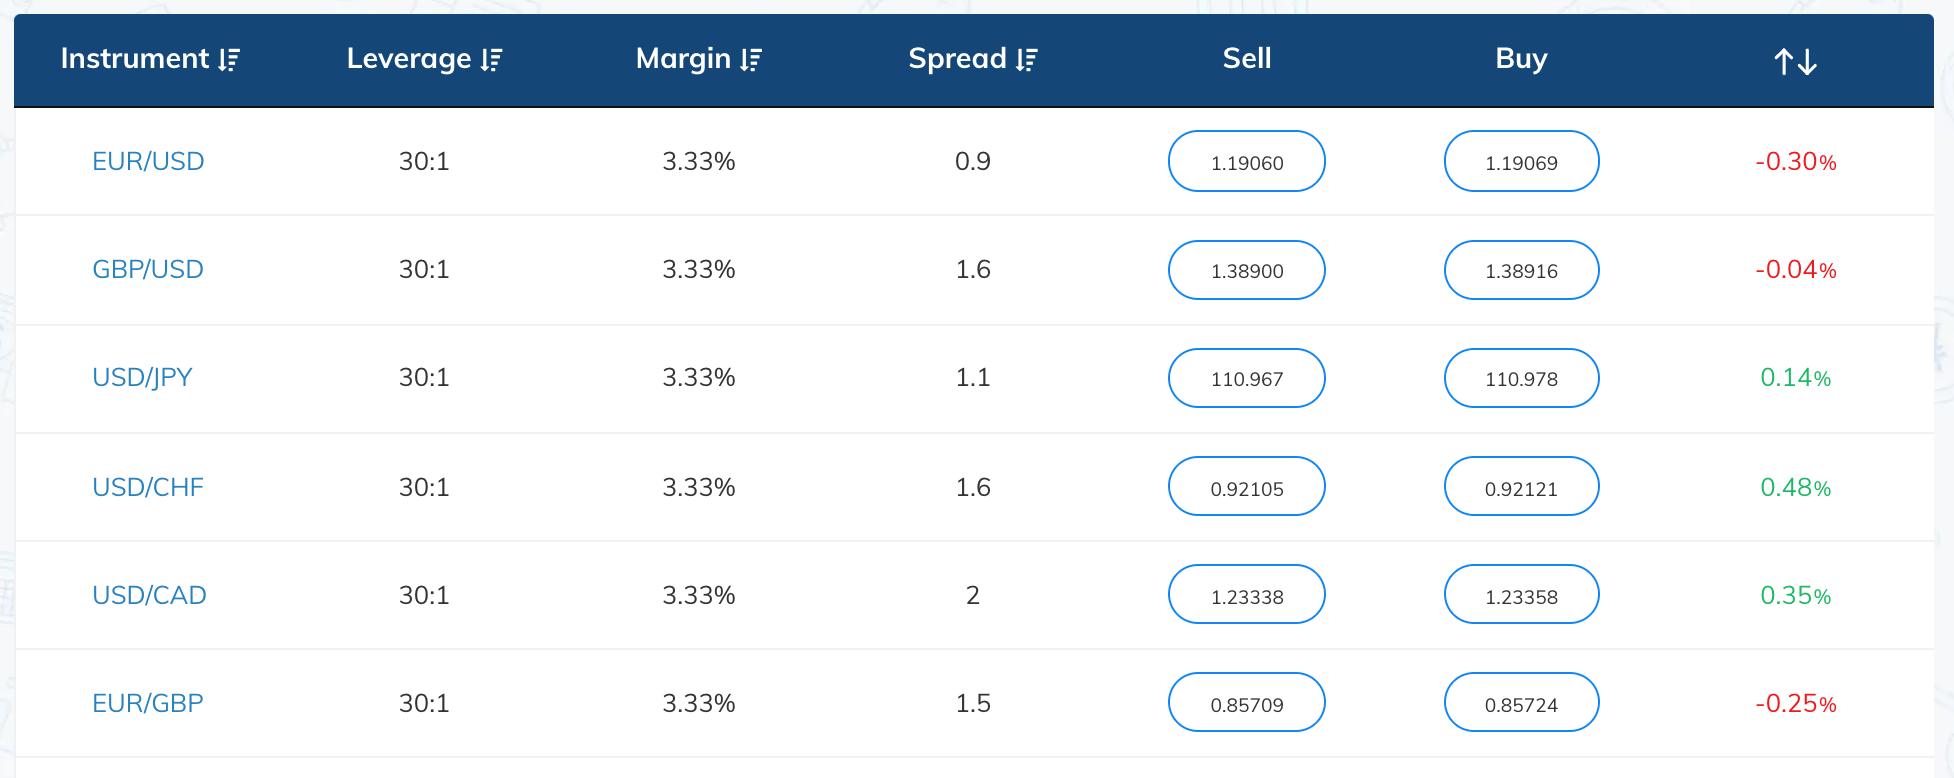 forex broker fees canada